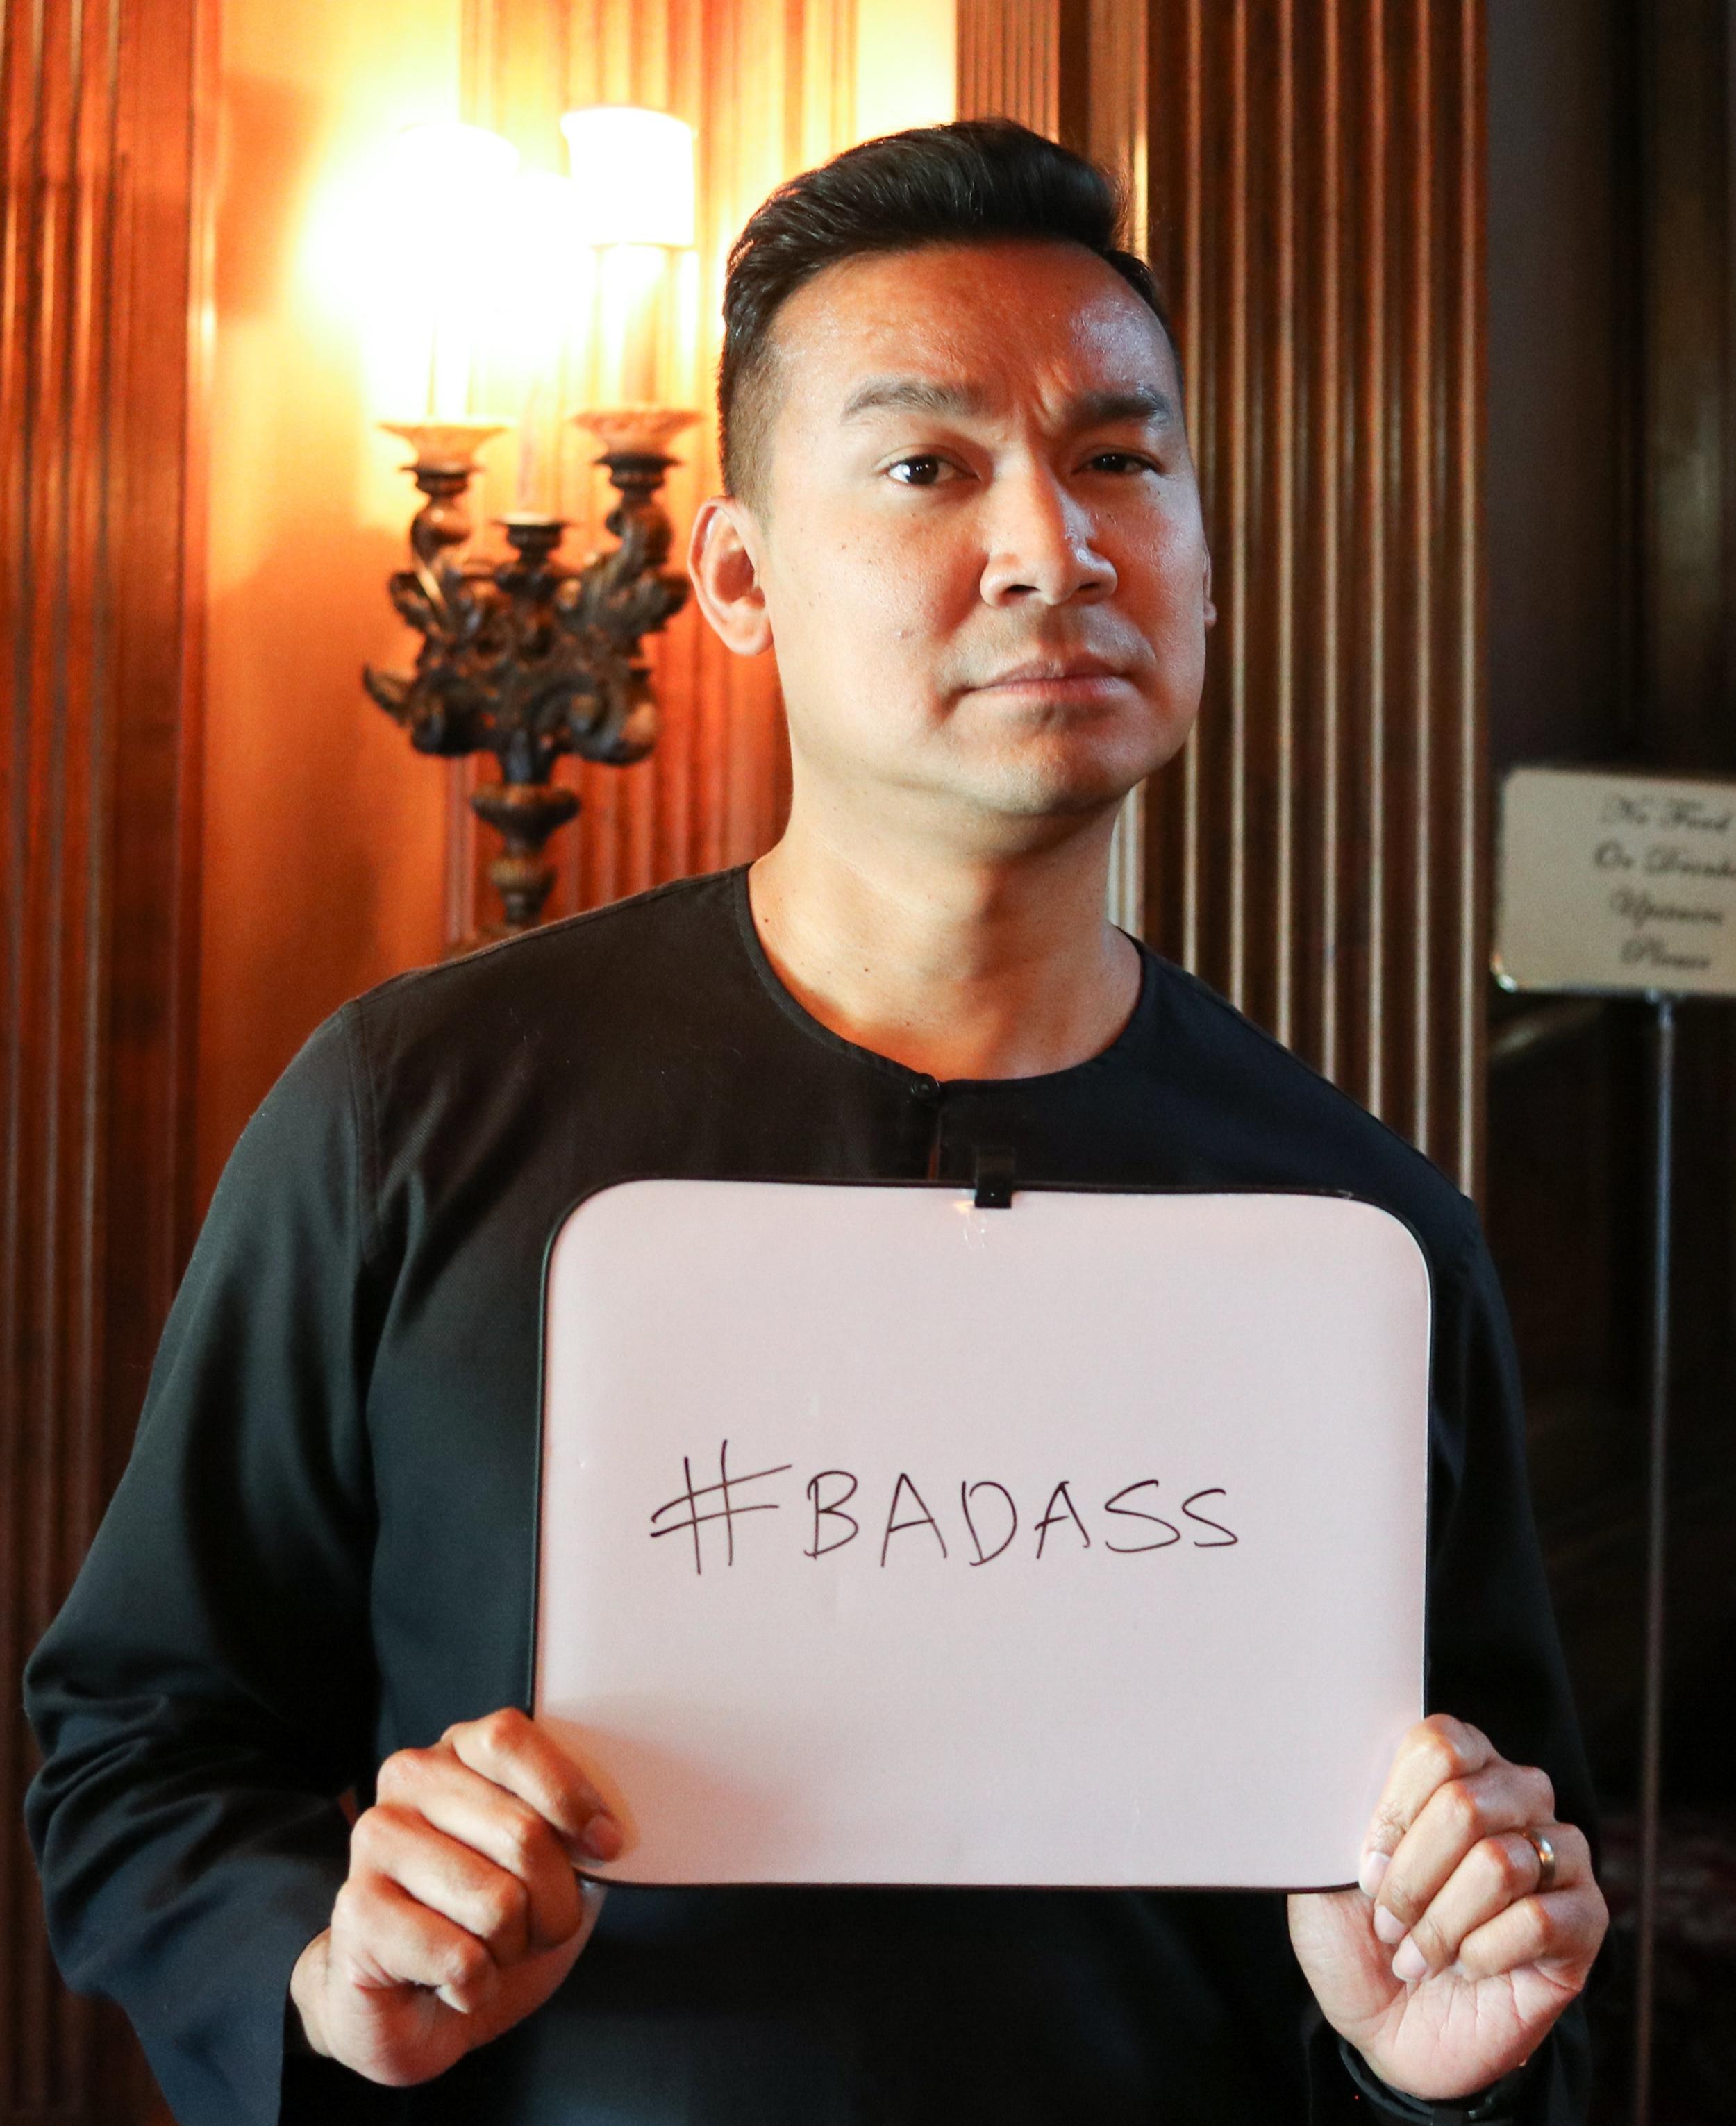 RafiQ is a certified #badass.